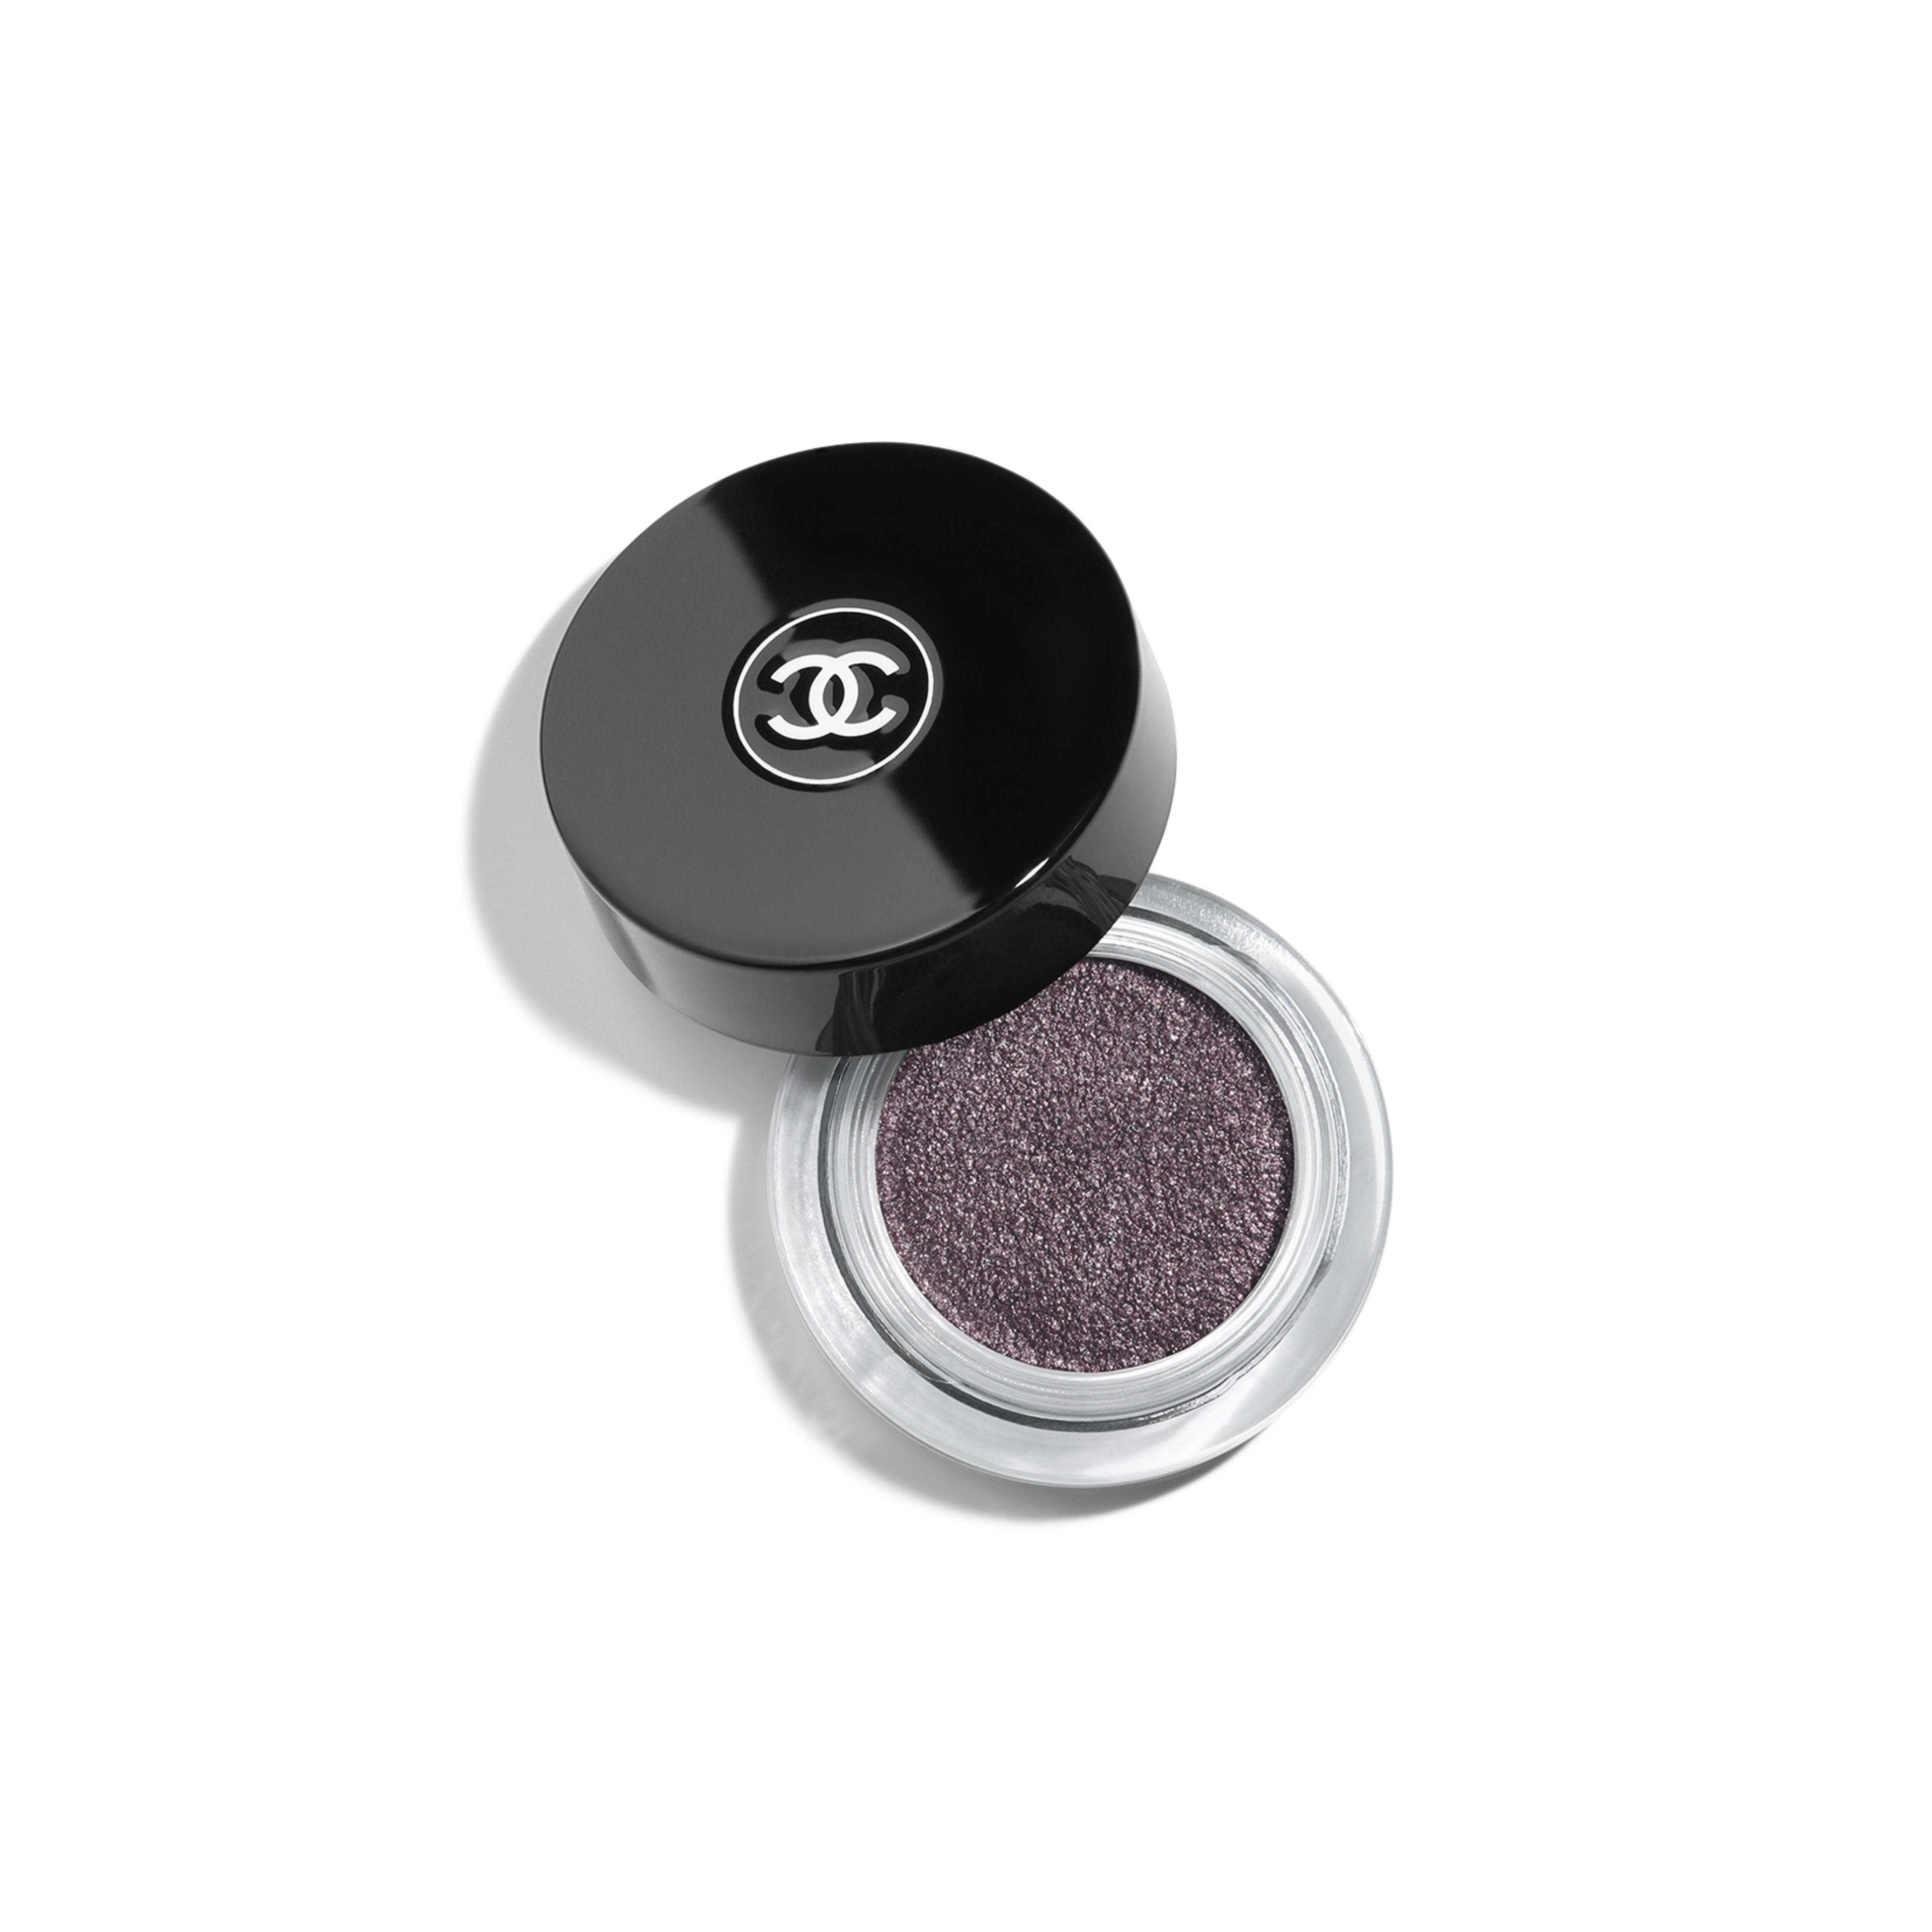 ILLUSION D'OMBRE - makeup - 4g - 預設視圖